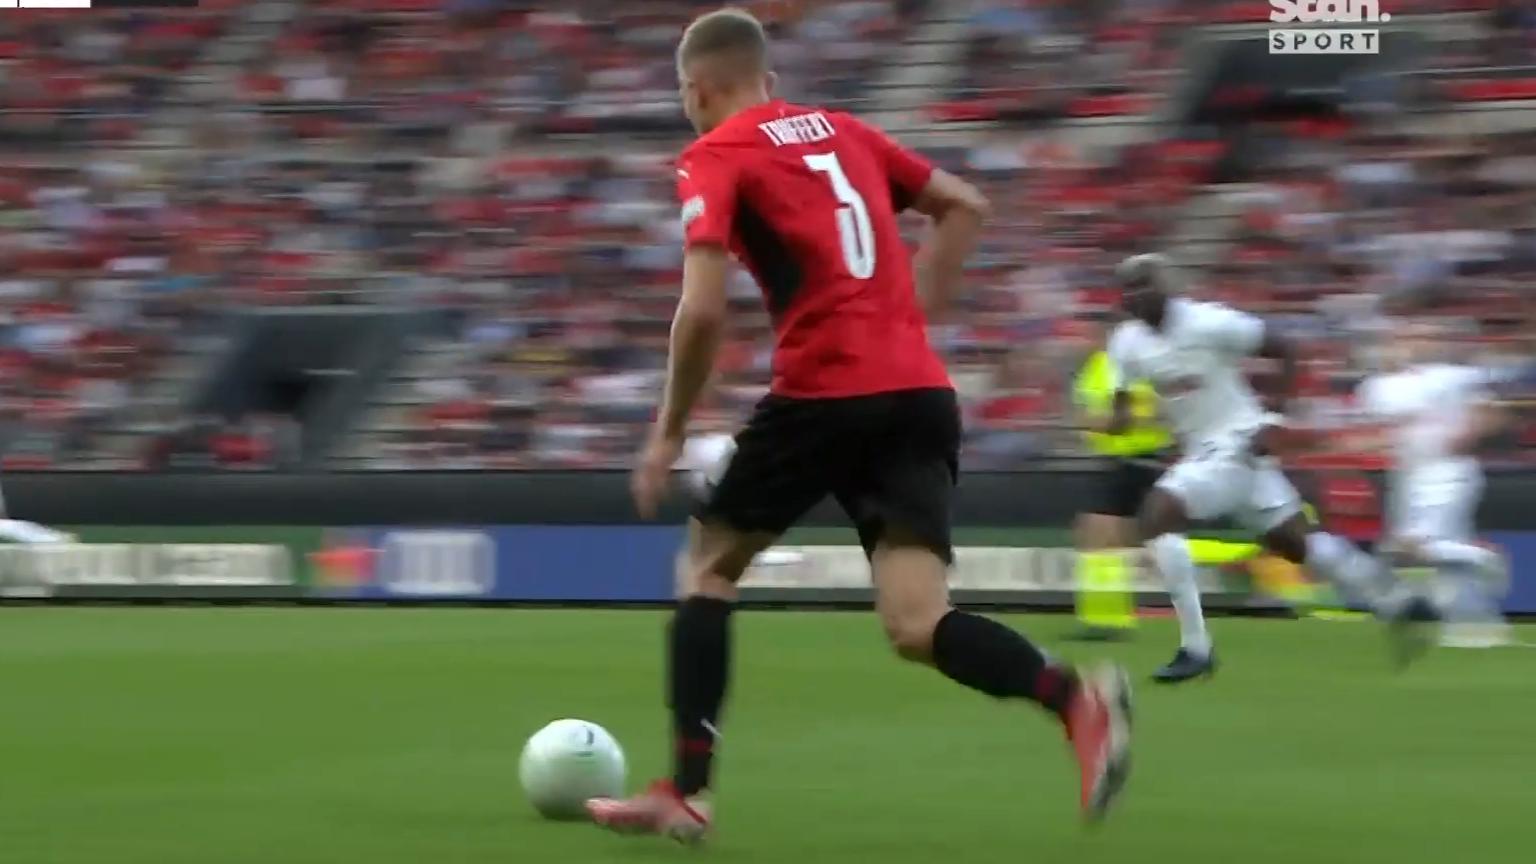 Europa Conference League highlights: Rennes vs Tottenham